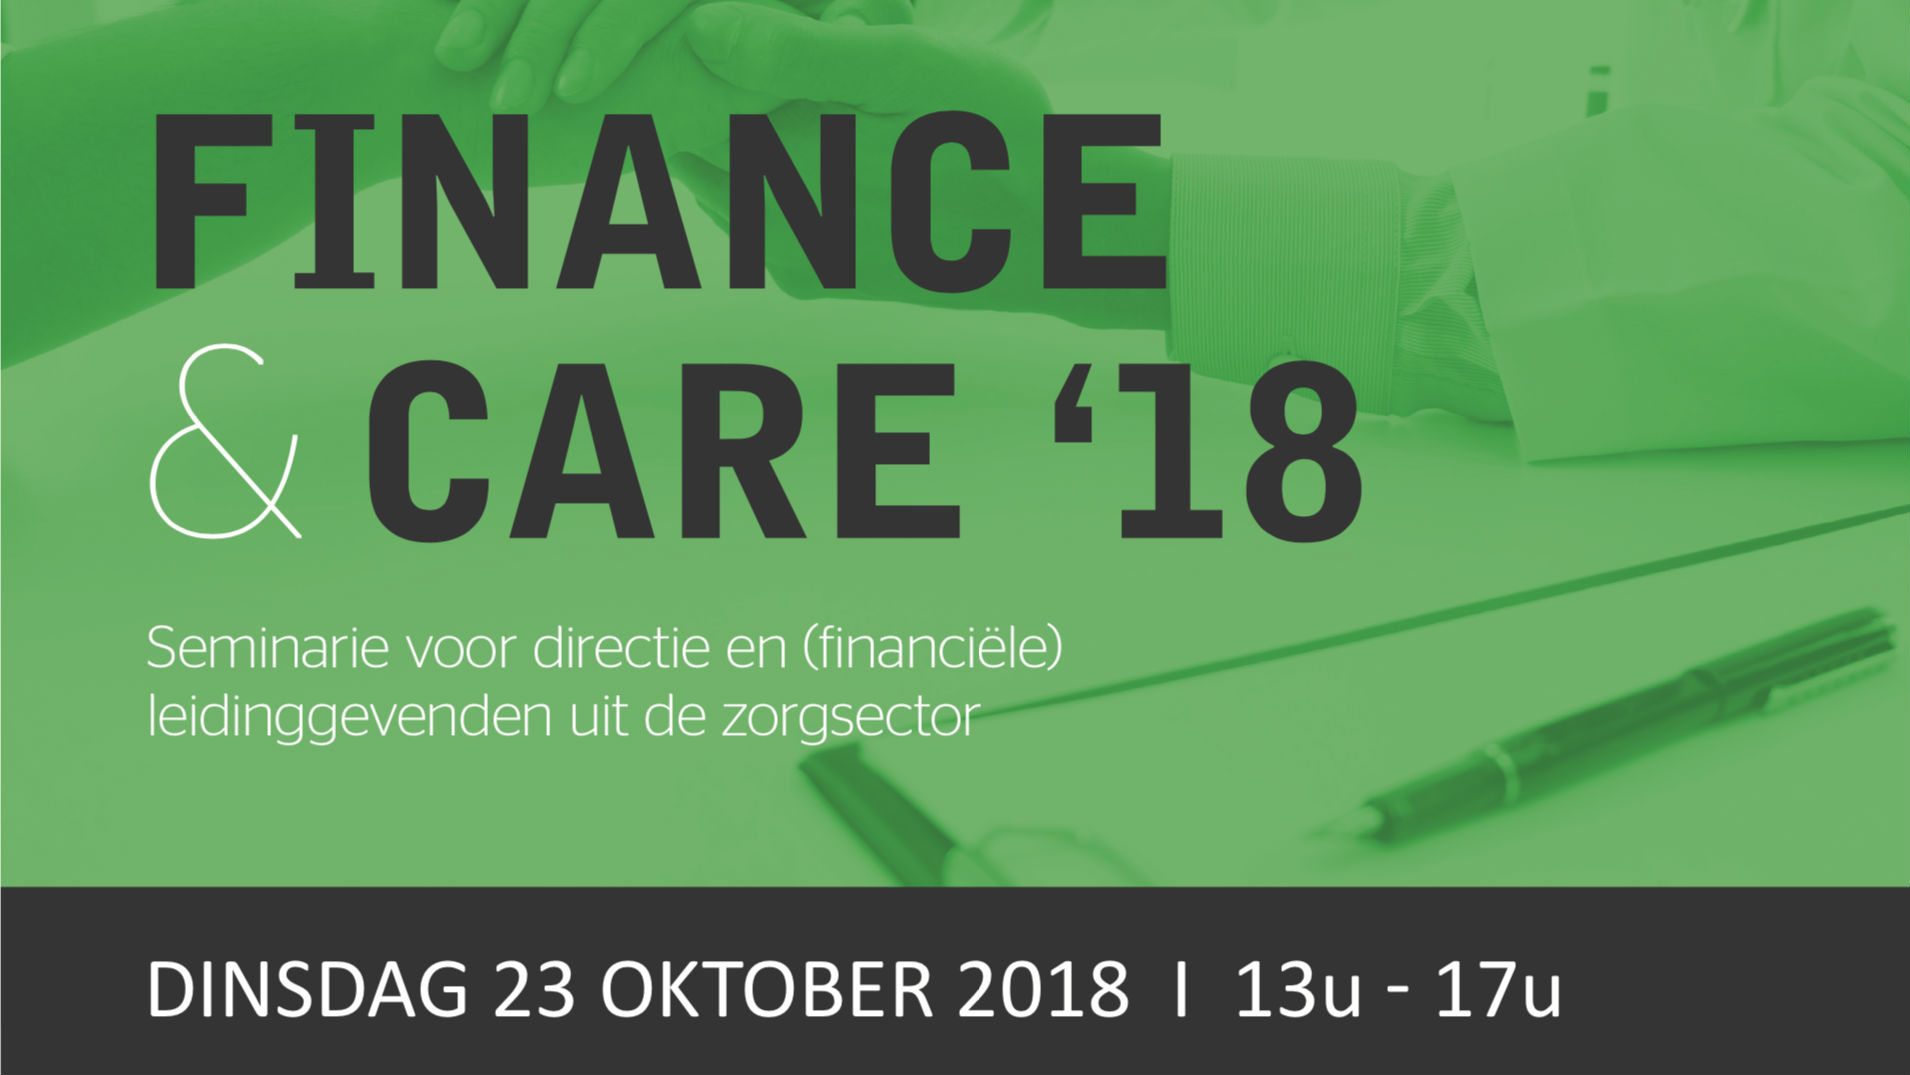 Finance & Care